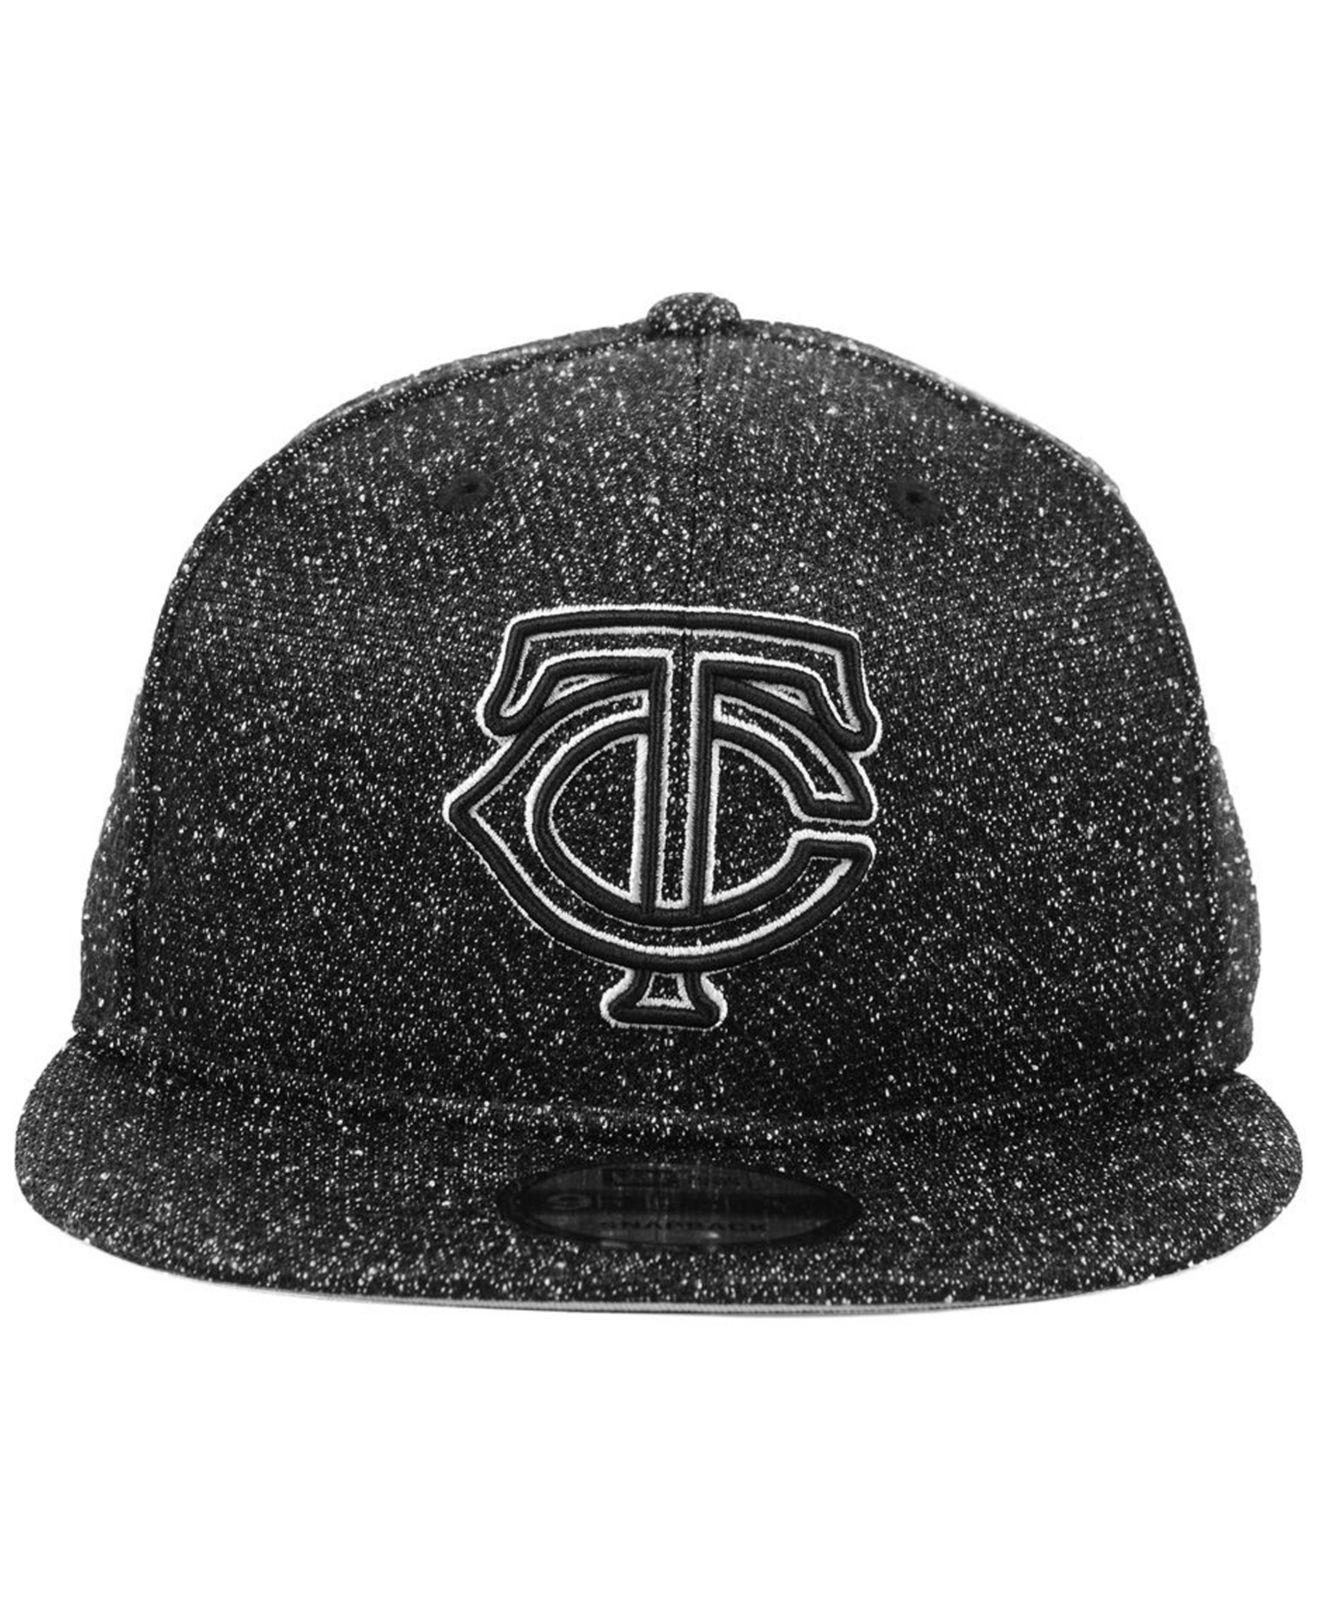 newest 4cfb8 8550e Lyst - KTZ Minnesota Twins Spec 9fifty Snapback Cap in Black for Men